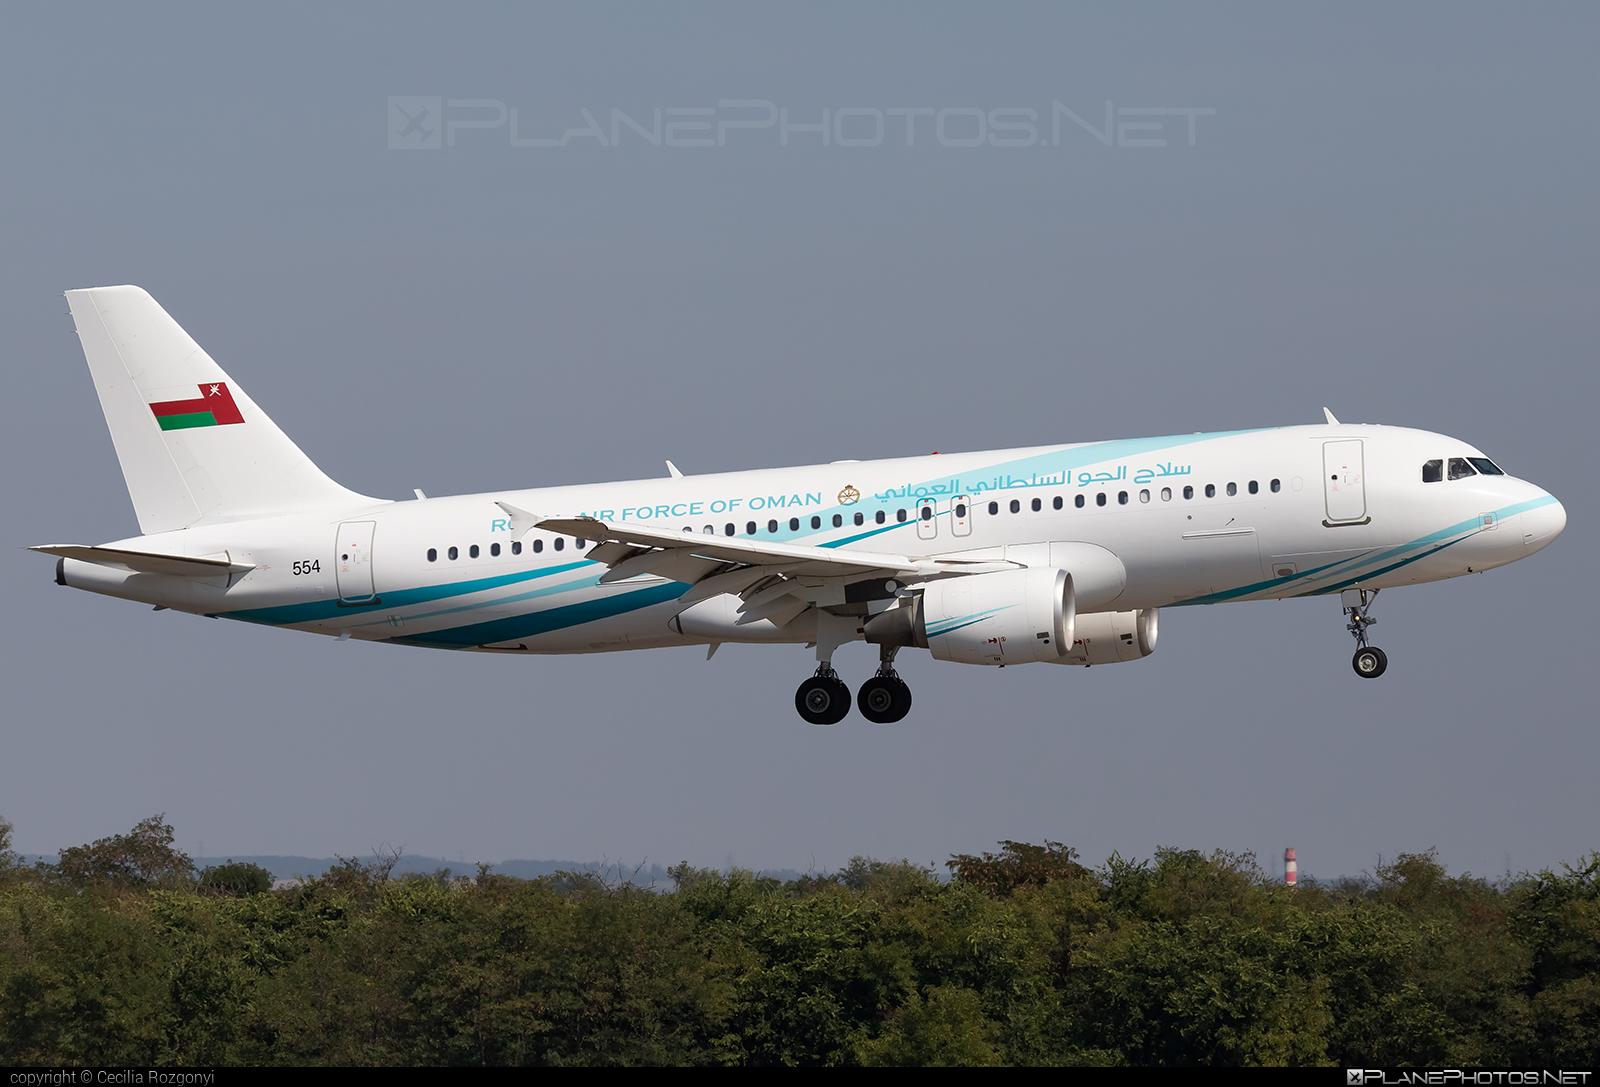 Airbus A320-214 - 554 operated by Silāh al-Jaww as-Sultāniy 'Umān (Royal Air Force of Oman) #a320 #a320family #airbus #airbus320 #royalairforceofoman #silaaljawwassultaniyuman